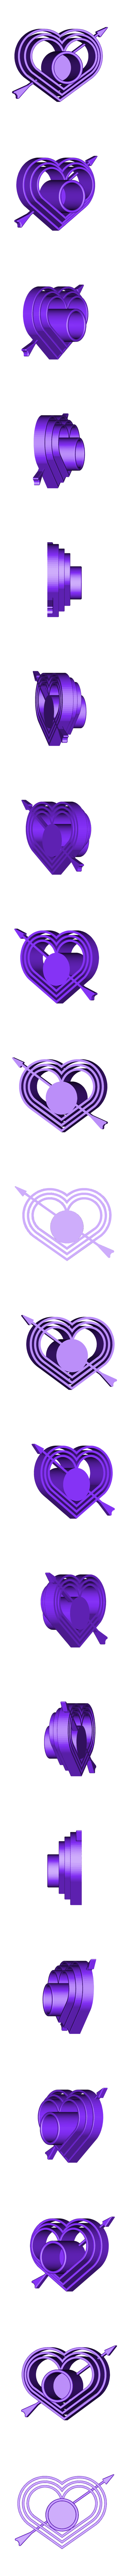 Coeur bougeoir.stl Download free STL file Heart Candle holder • 3D print design, rfbat